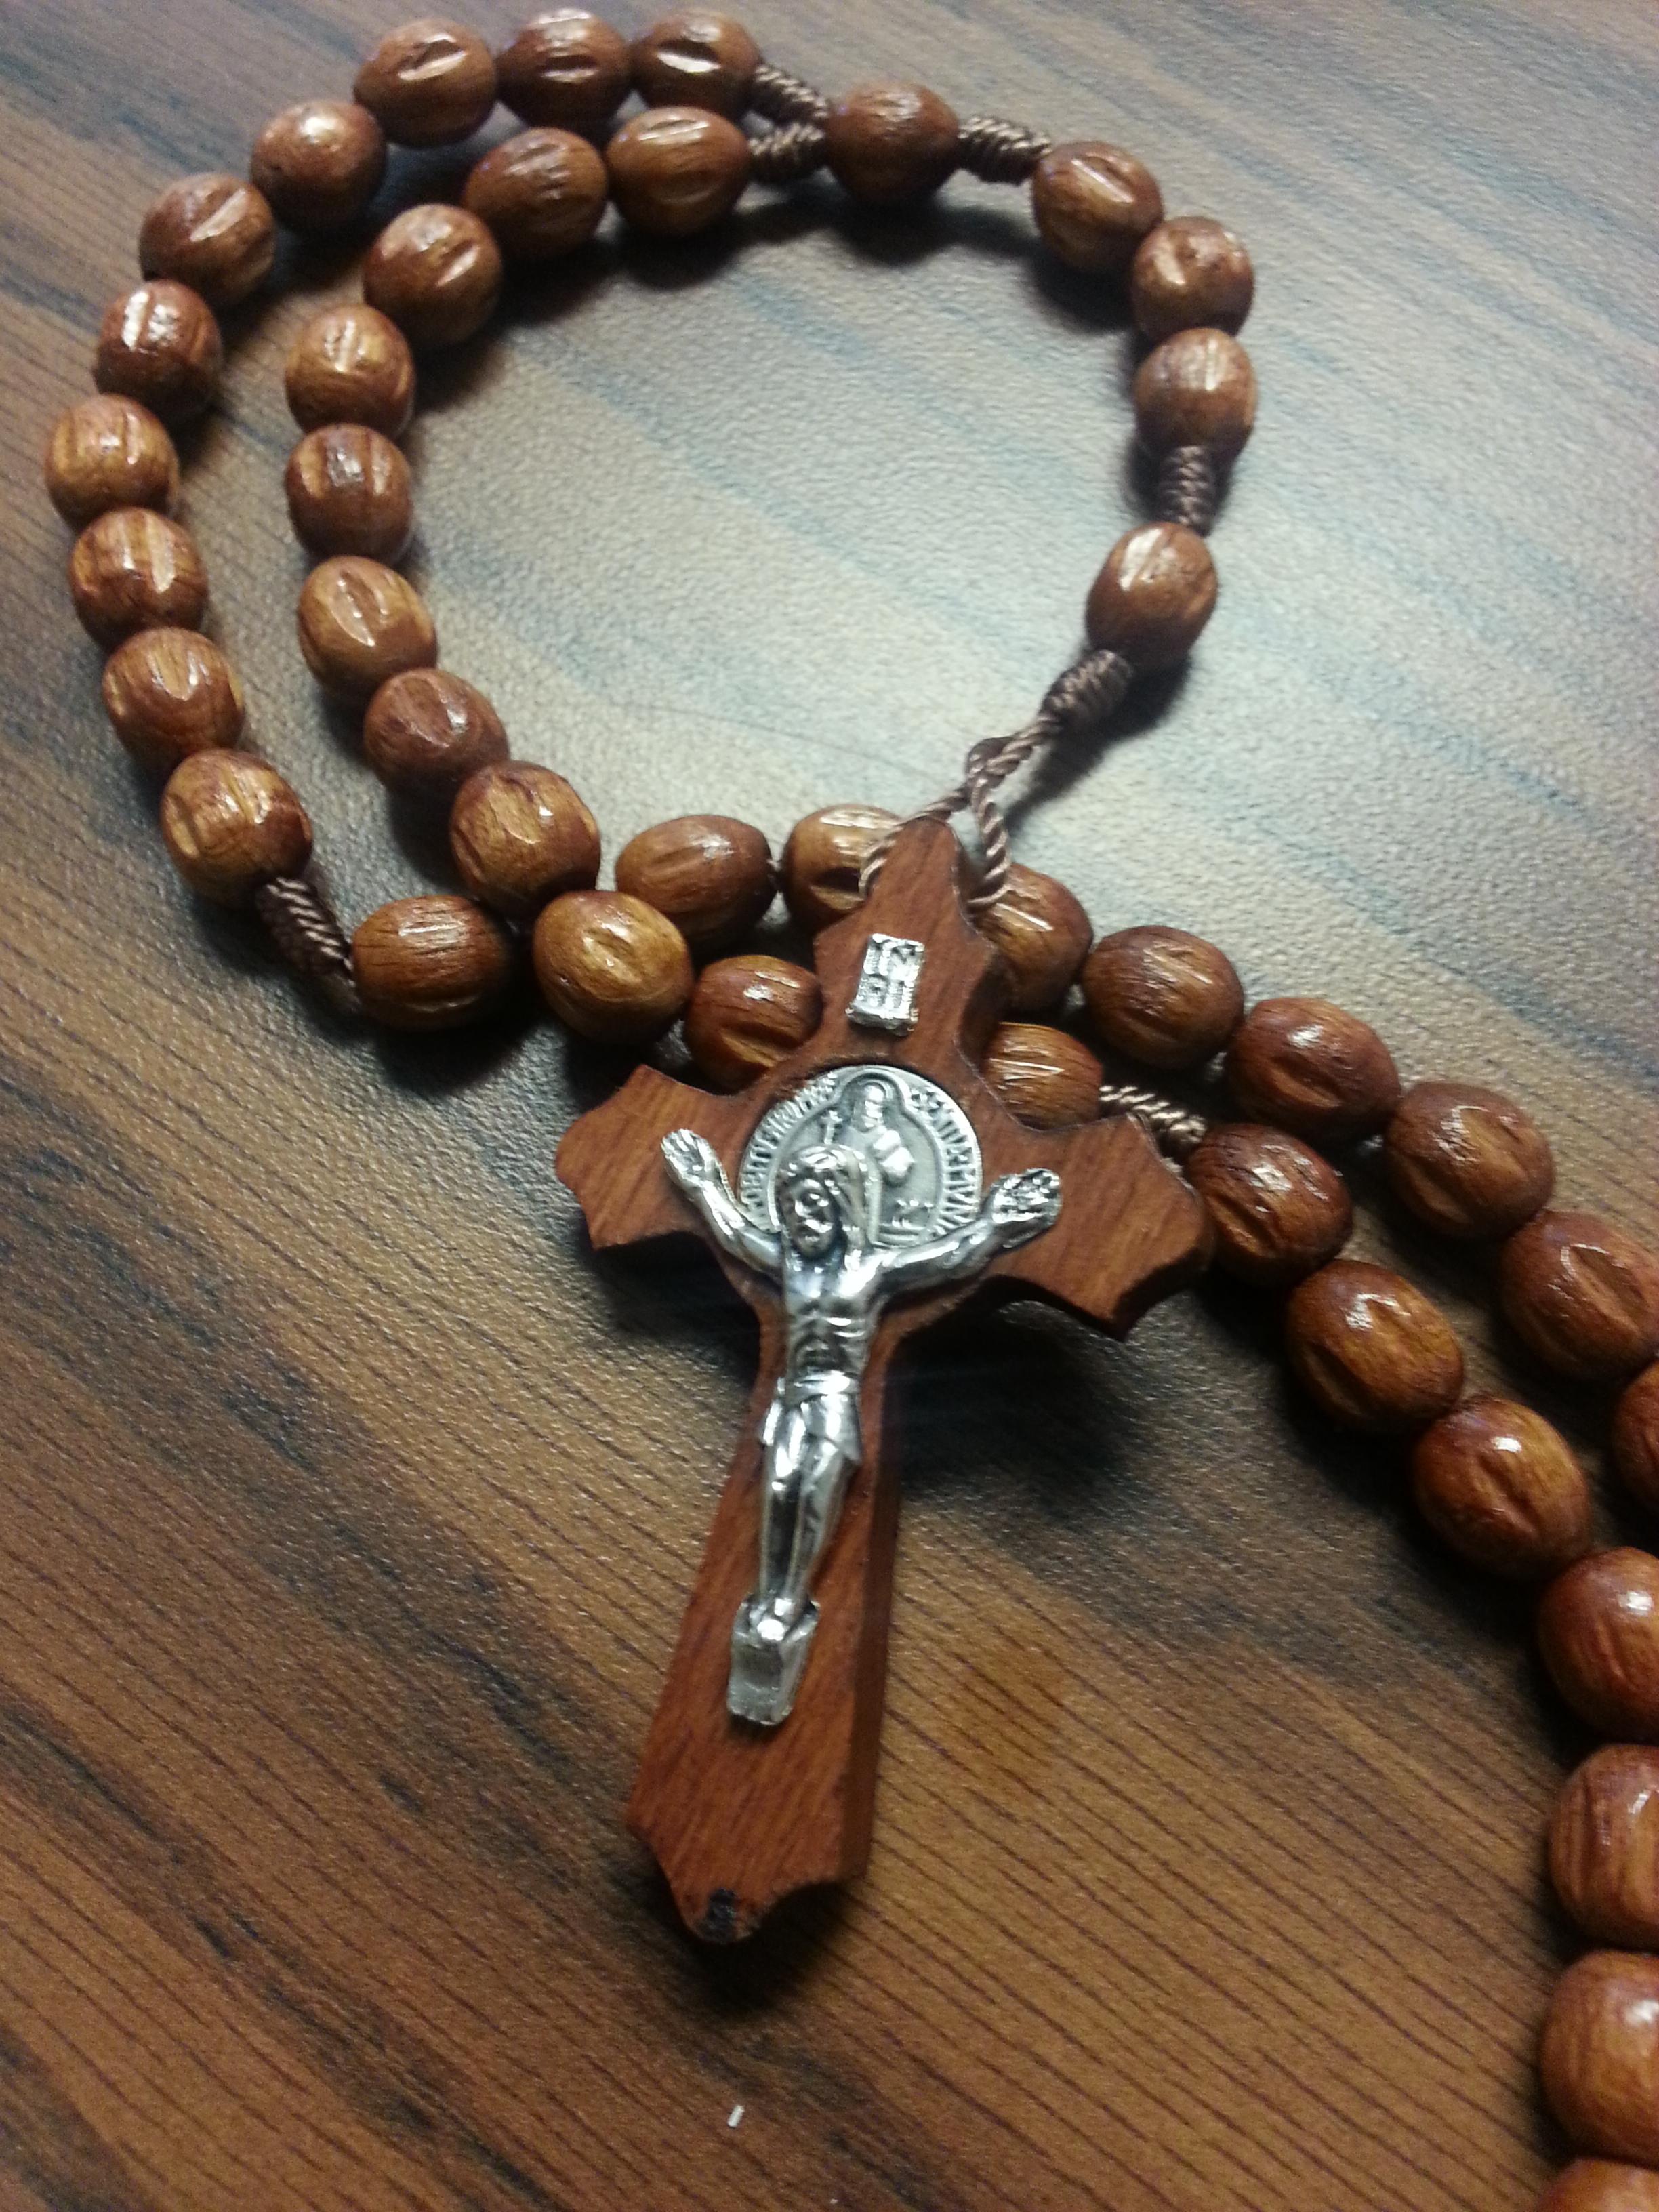 The Rosary.jpg